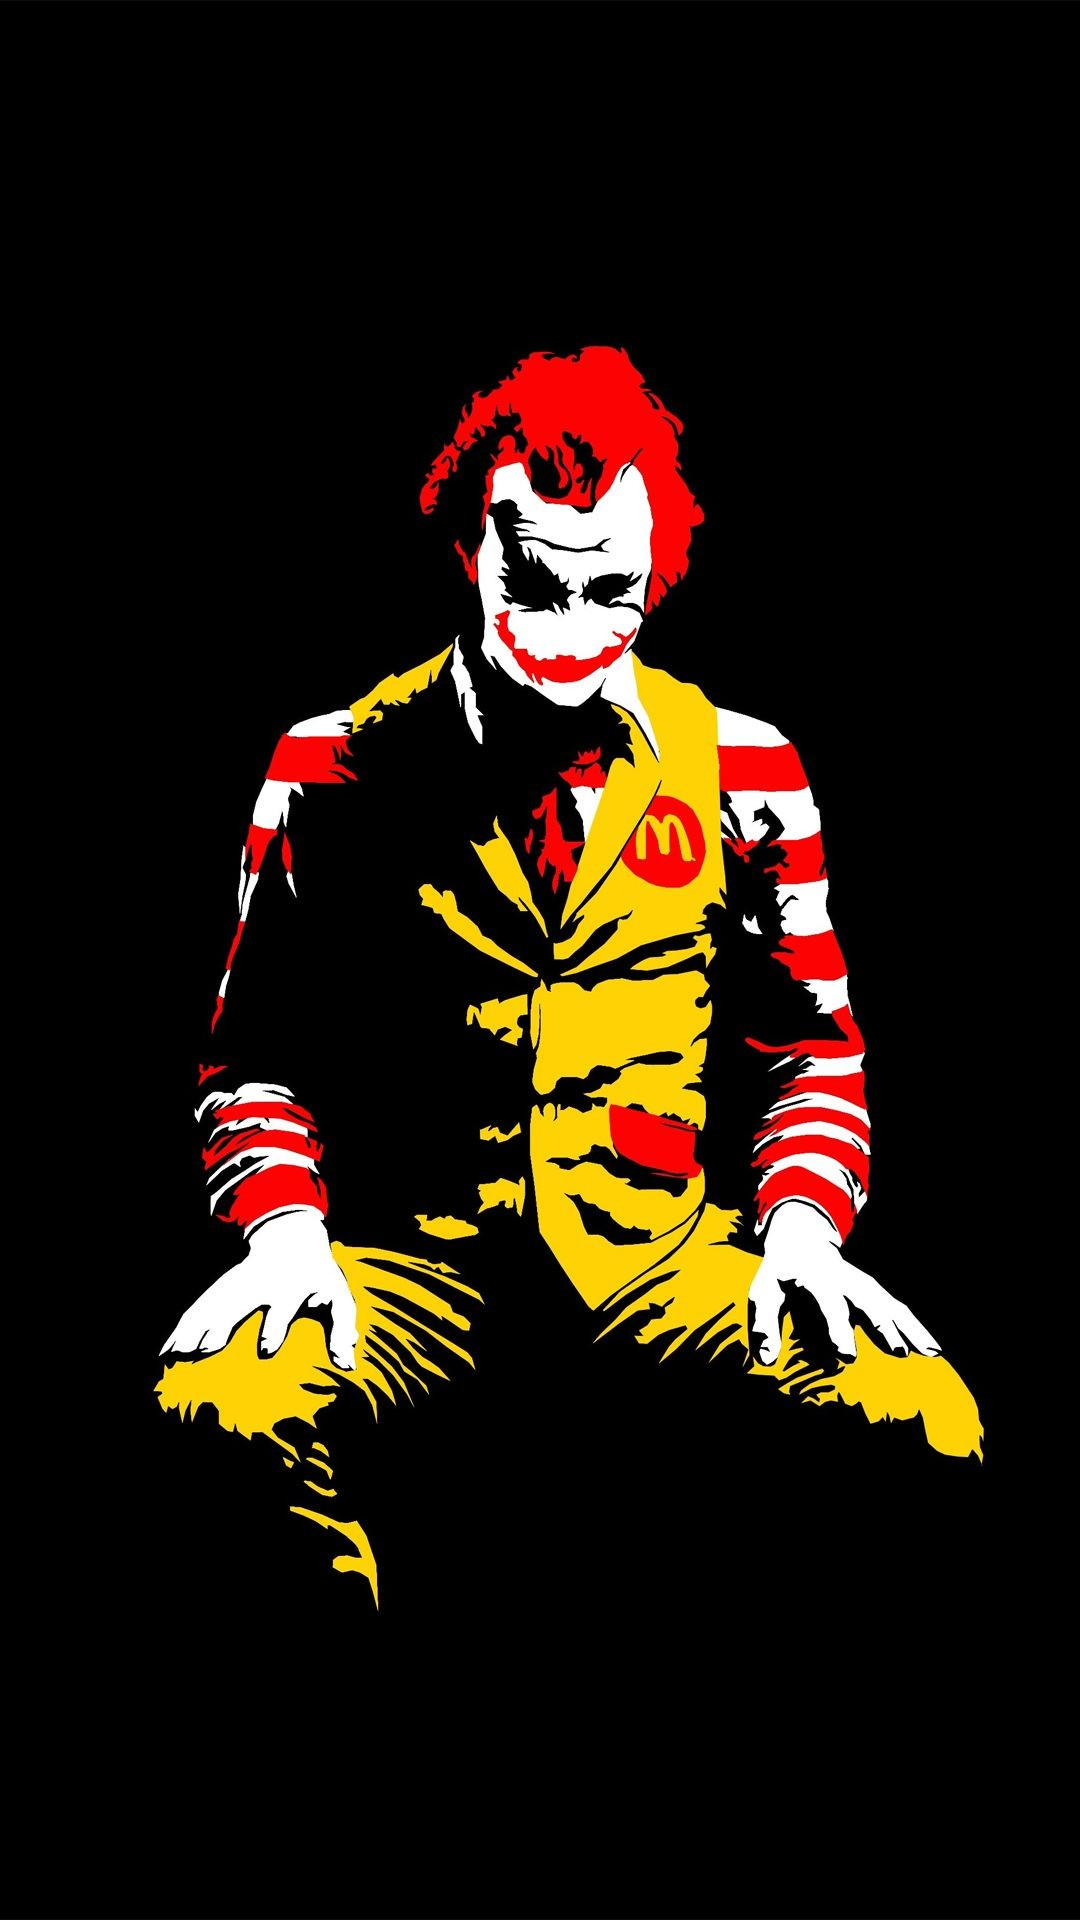 Joker Wallpaper eJOdq4 - Supportive Guru